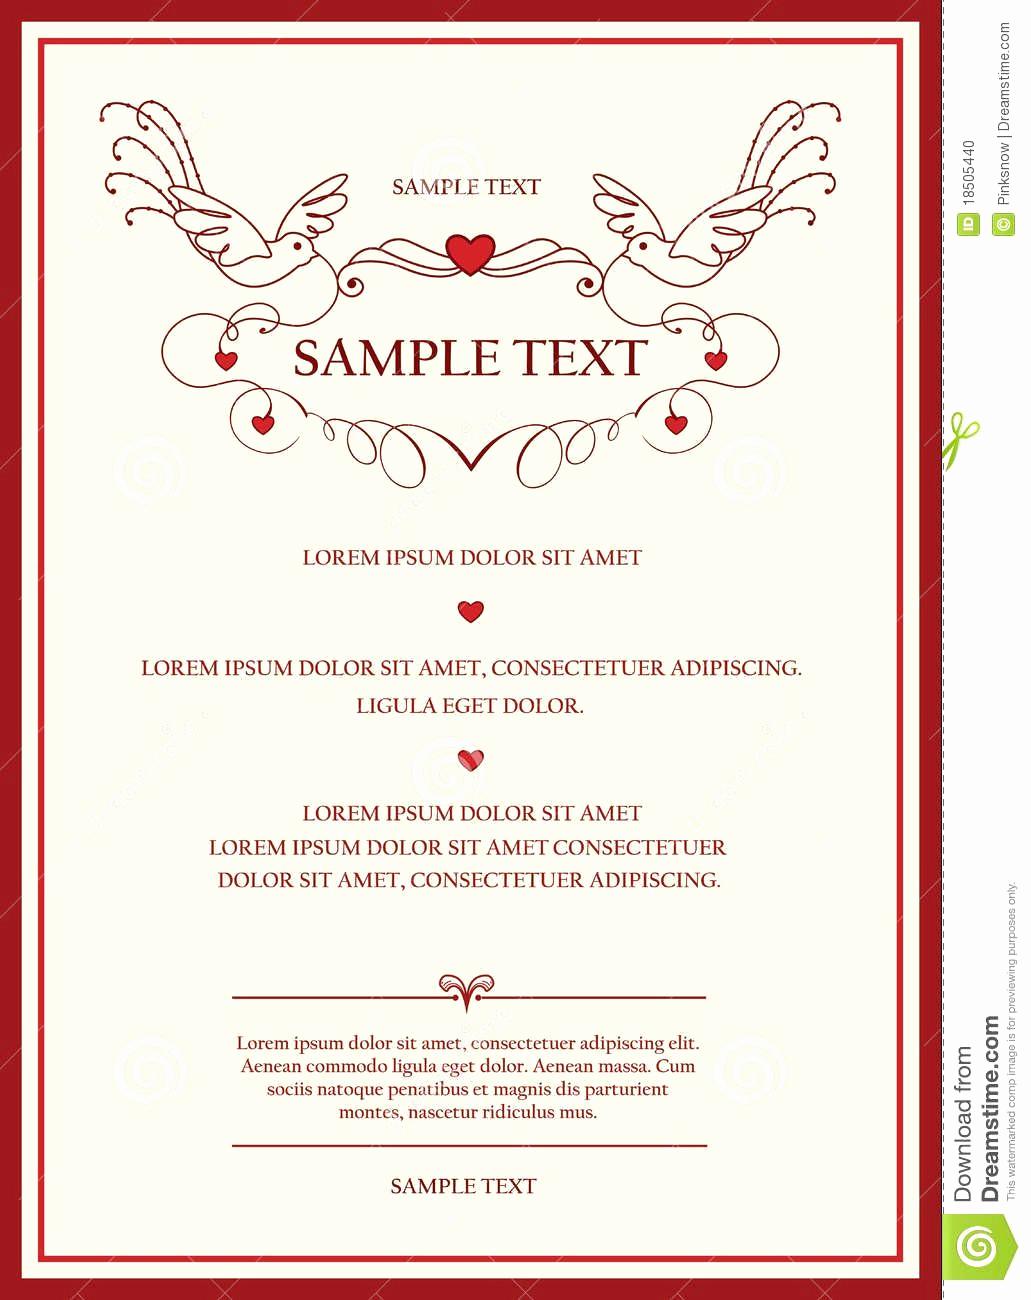 Church Invitation Cards Templates New Church Invitation Cards Templates Awesome Awesome Free